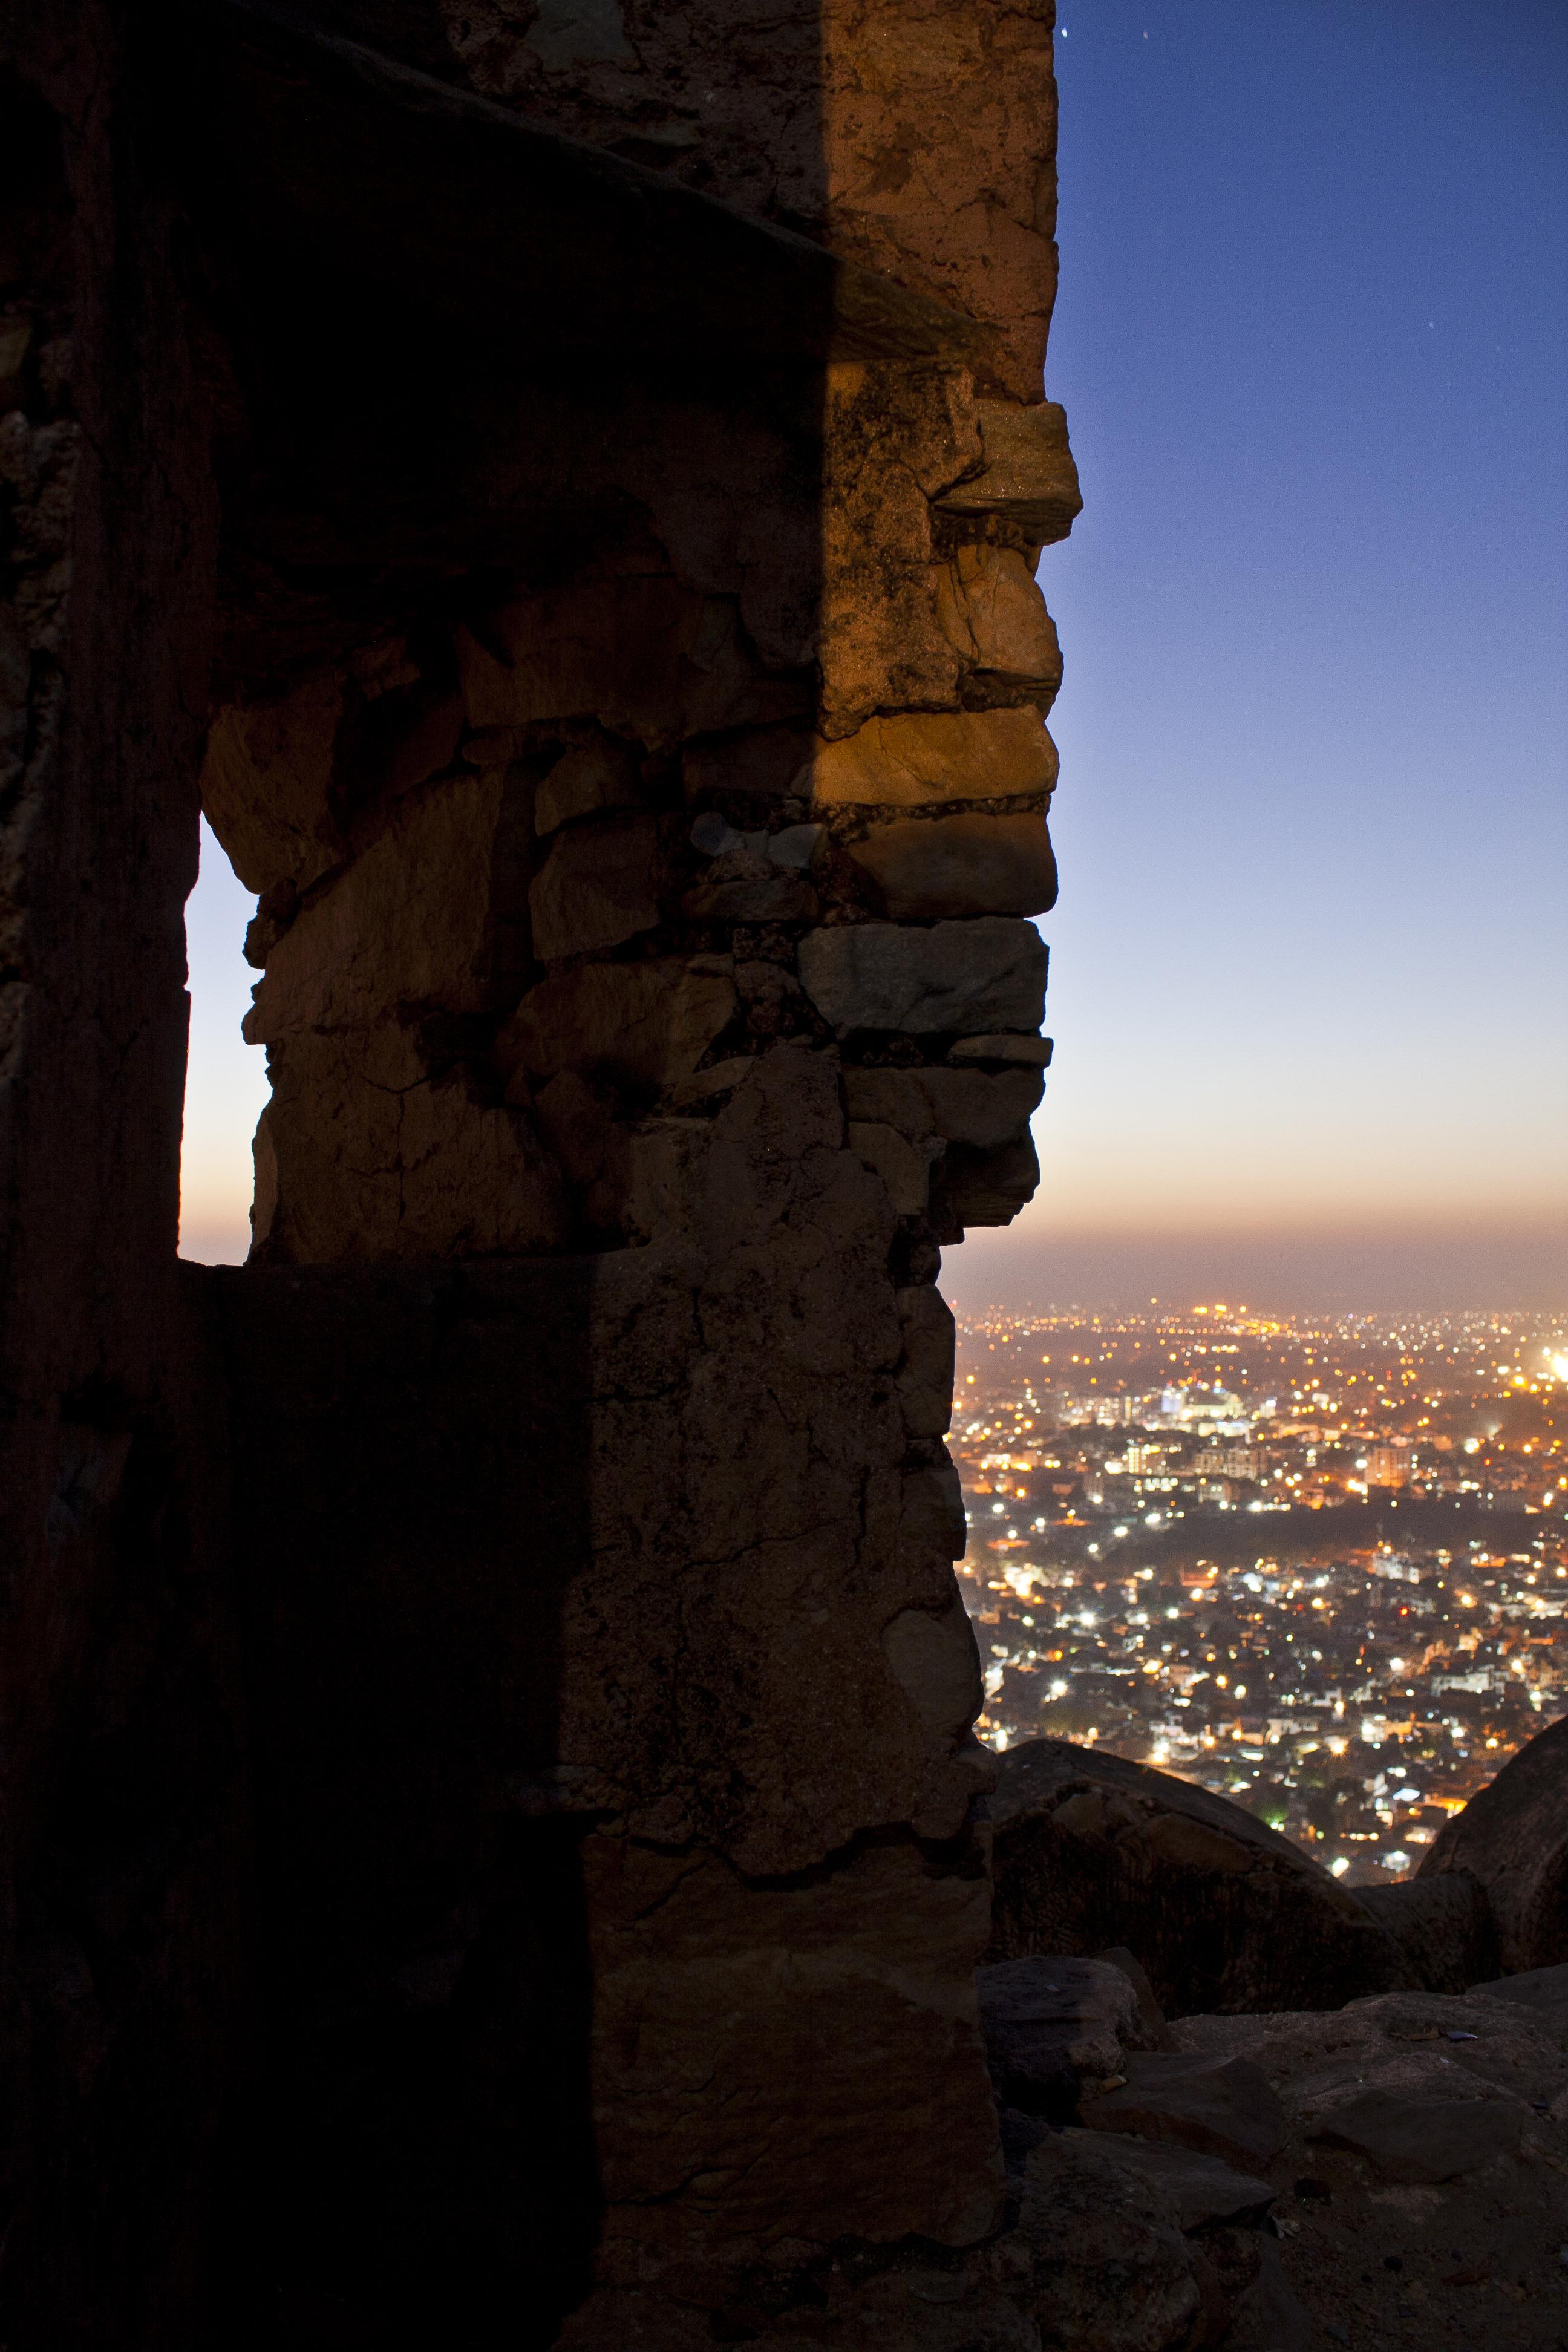 Night in Jaipur